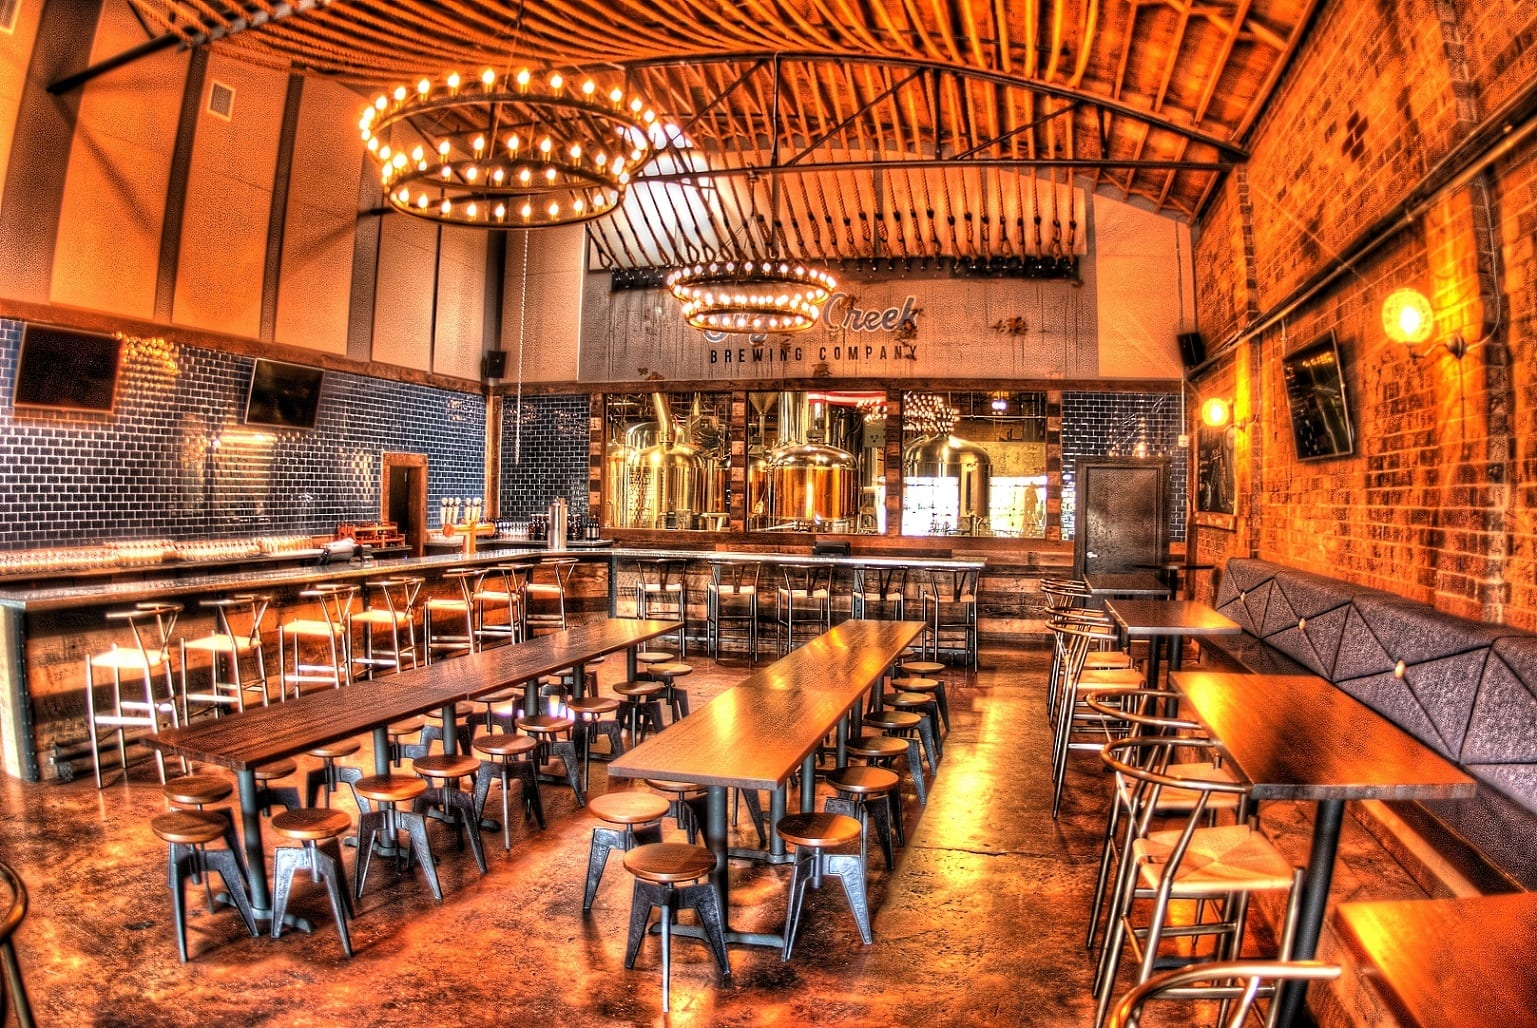 Explore the Taproom | Sugar Creek Brewing Company